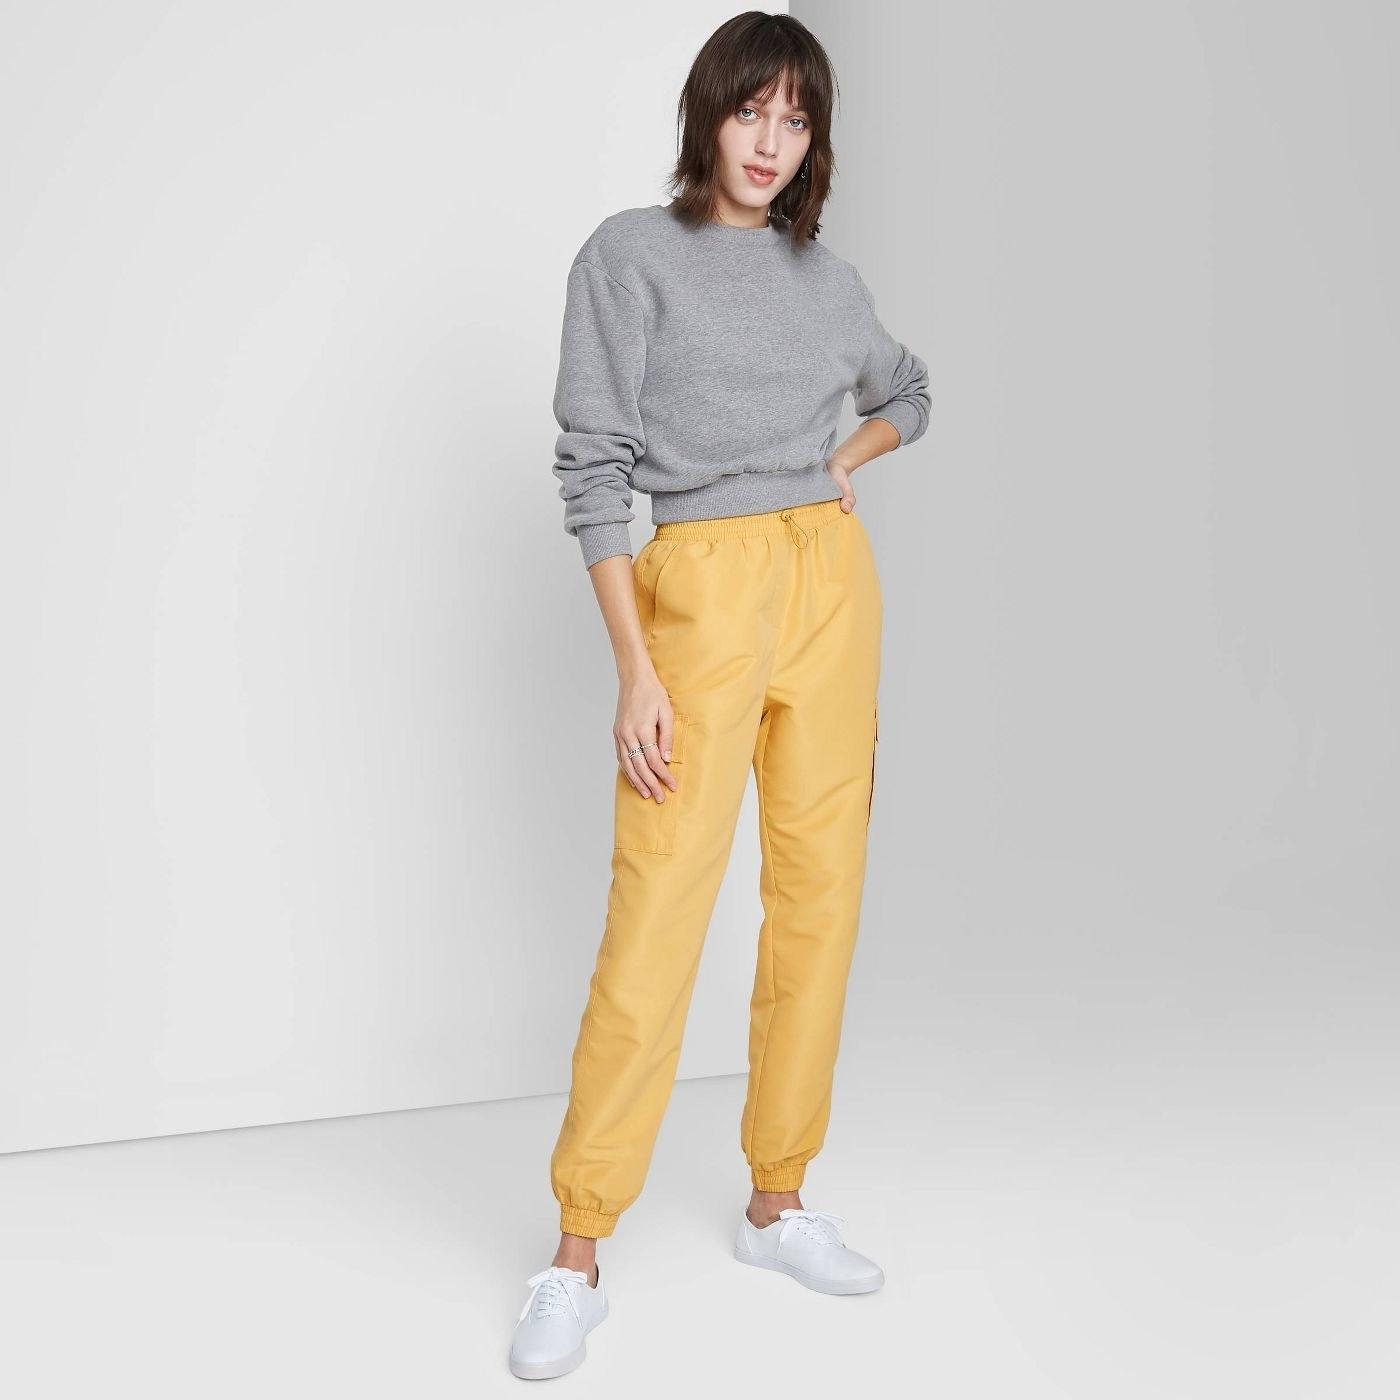 Model in cargo jogger pants